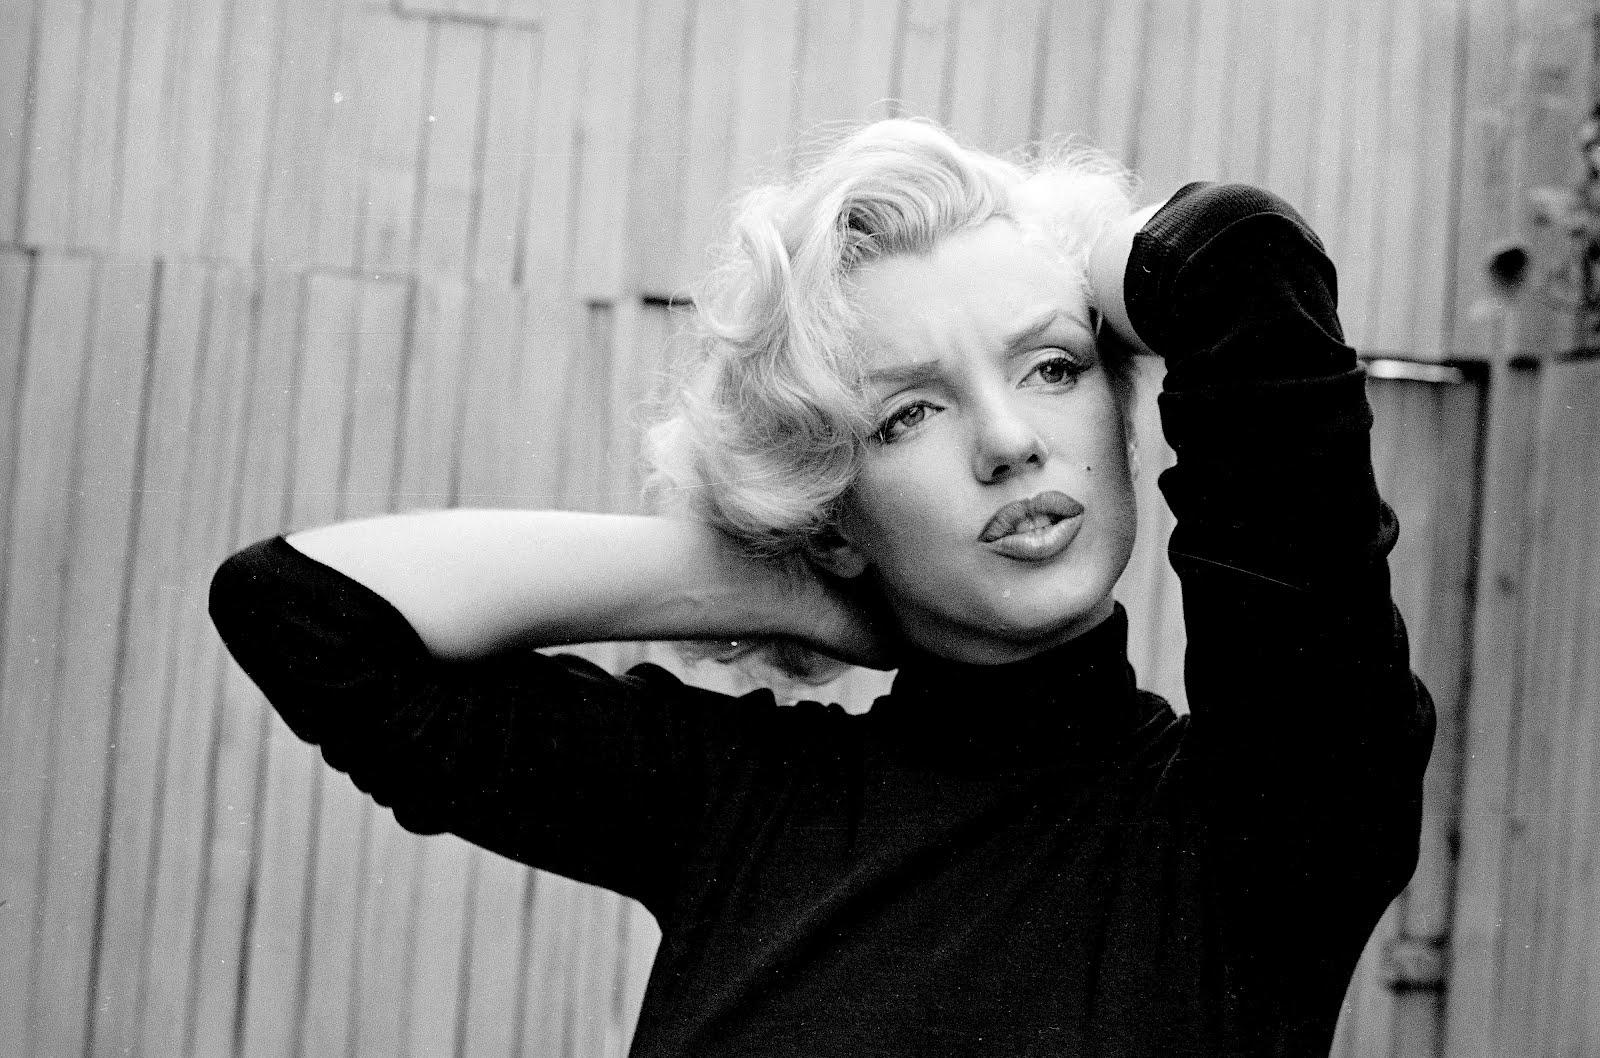 Film Talk Marilyn Monroe June 1 1926 August 5 1962